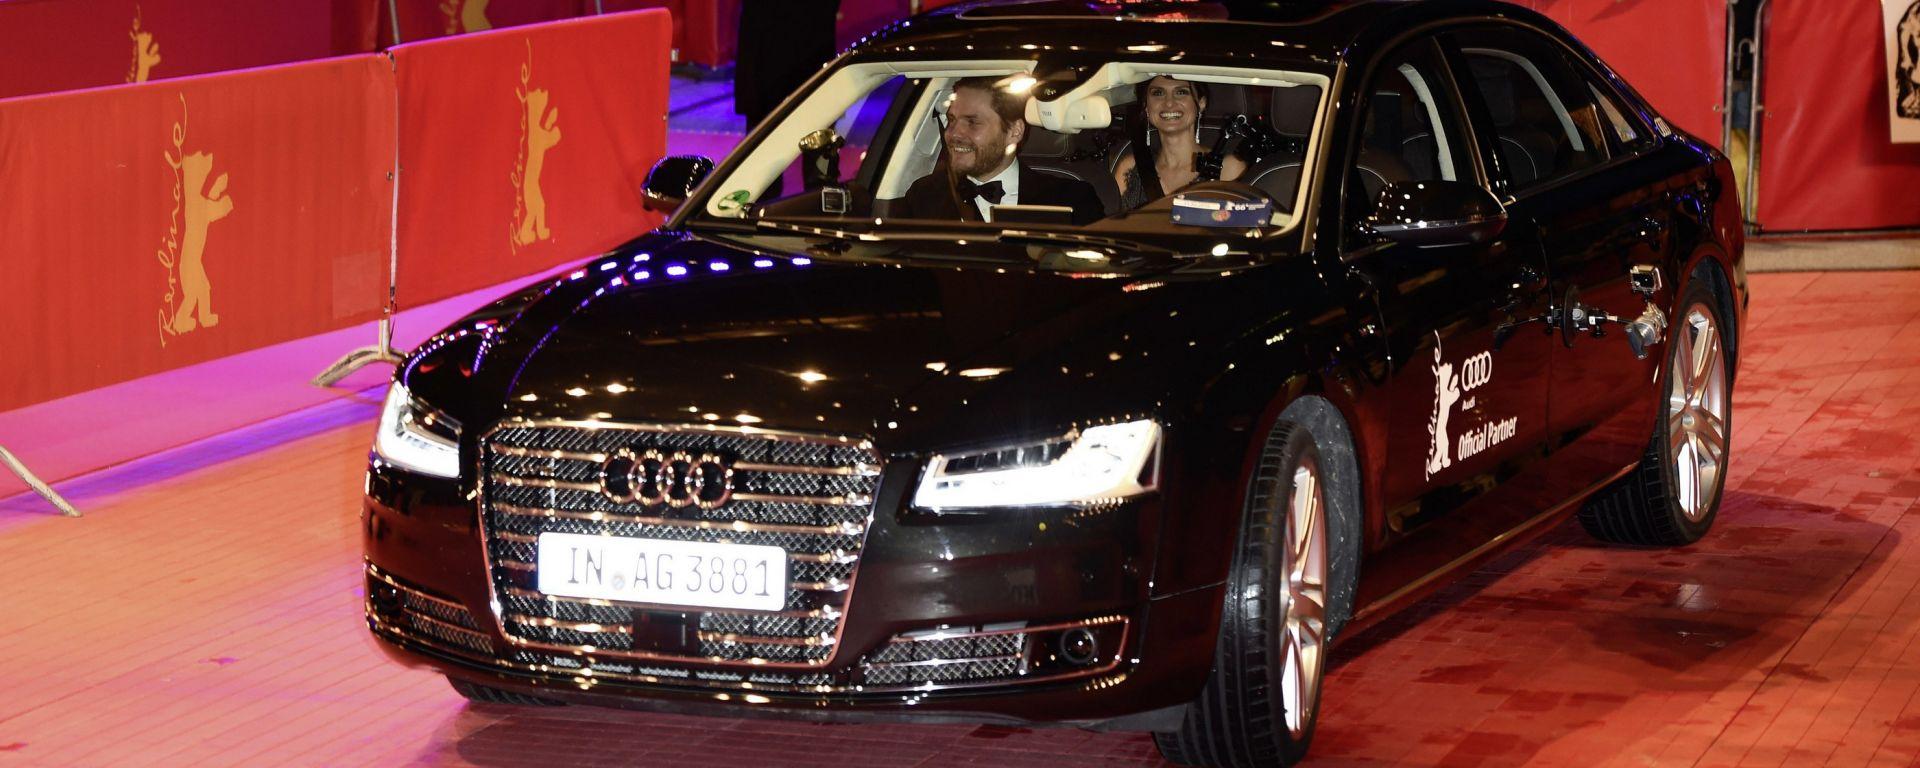 Audi protagonista al Berlinale Film Festival